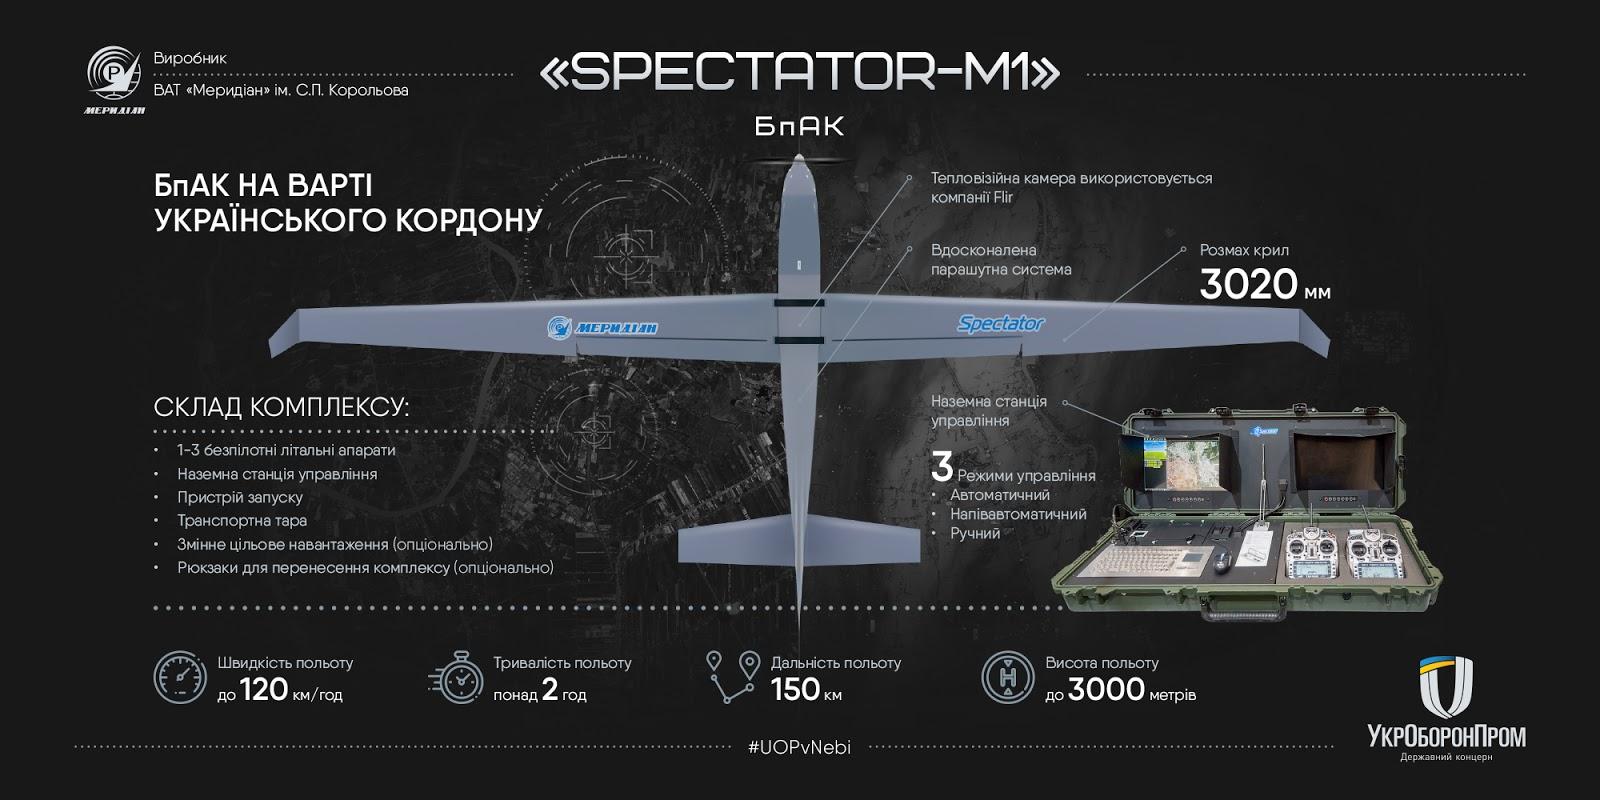 БпАК-МП-1 Spectator (Спектейтор)